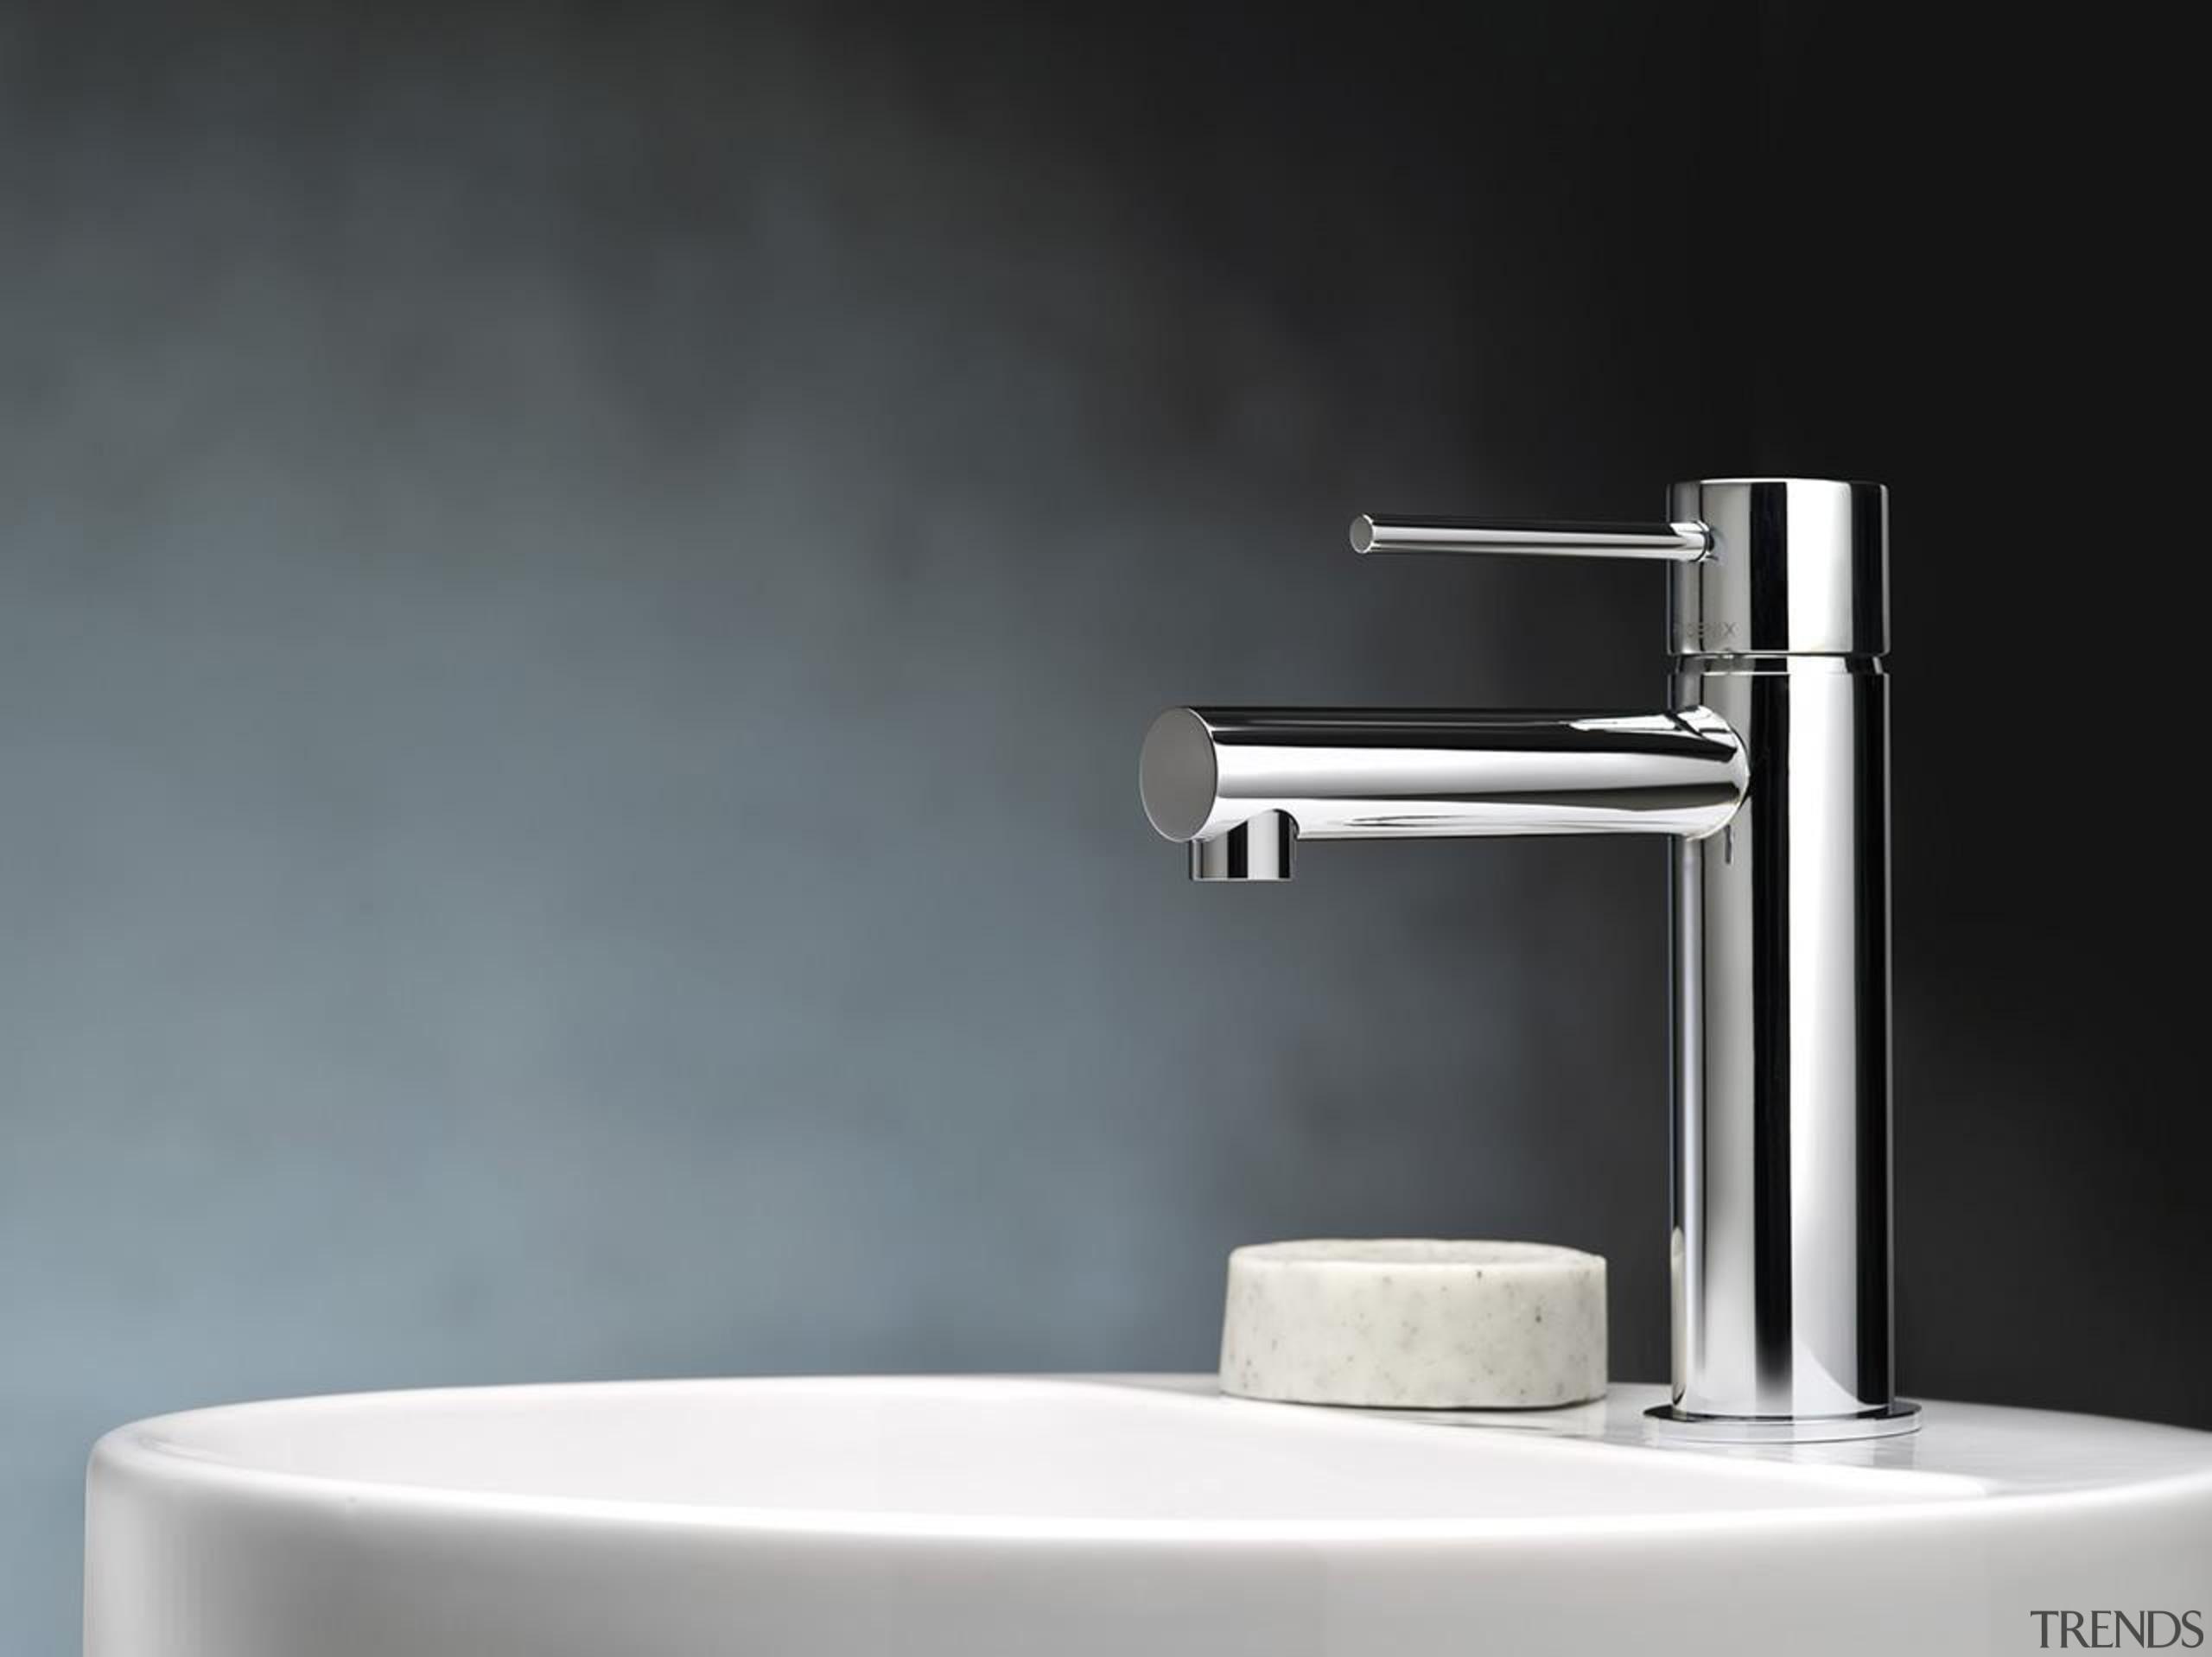 vivid slimline basin mixer - Our Product - bathroom sink, plumbing fixture, product, product design, tap, black, gray